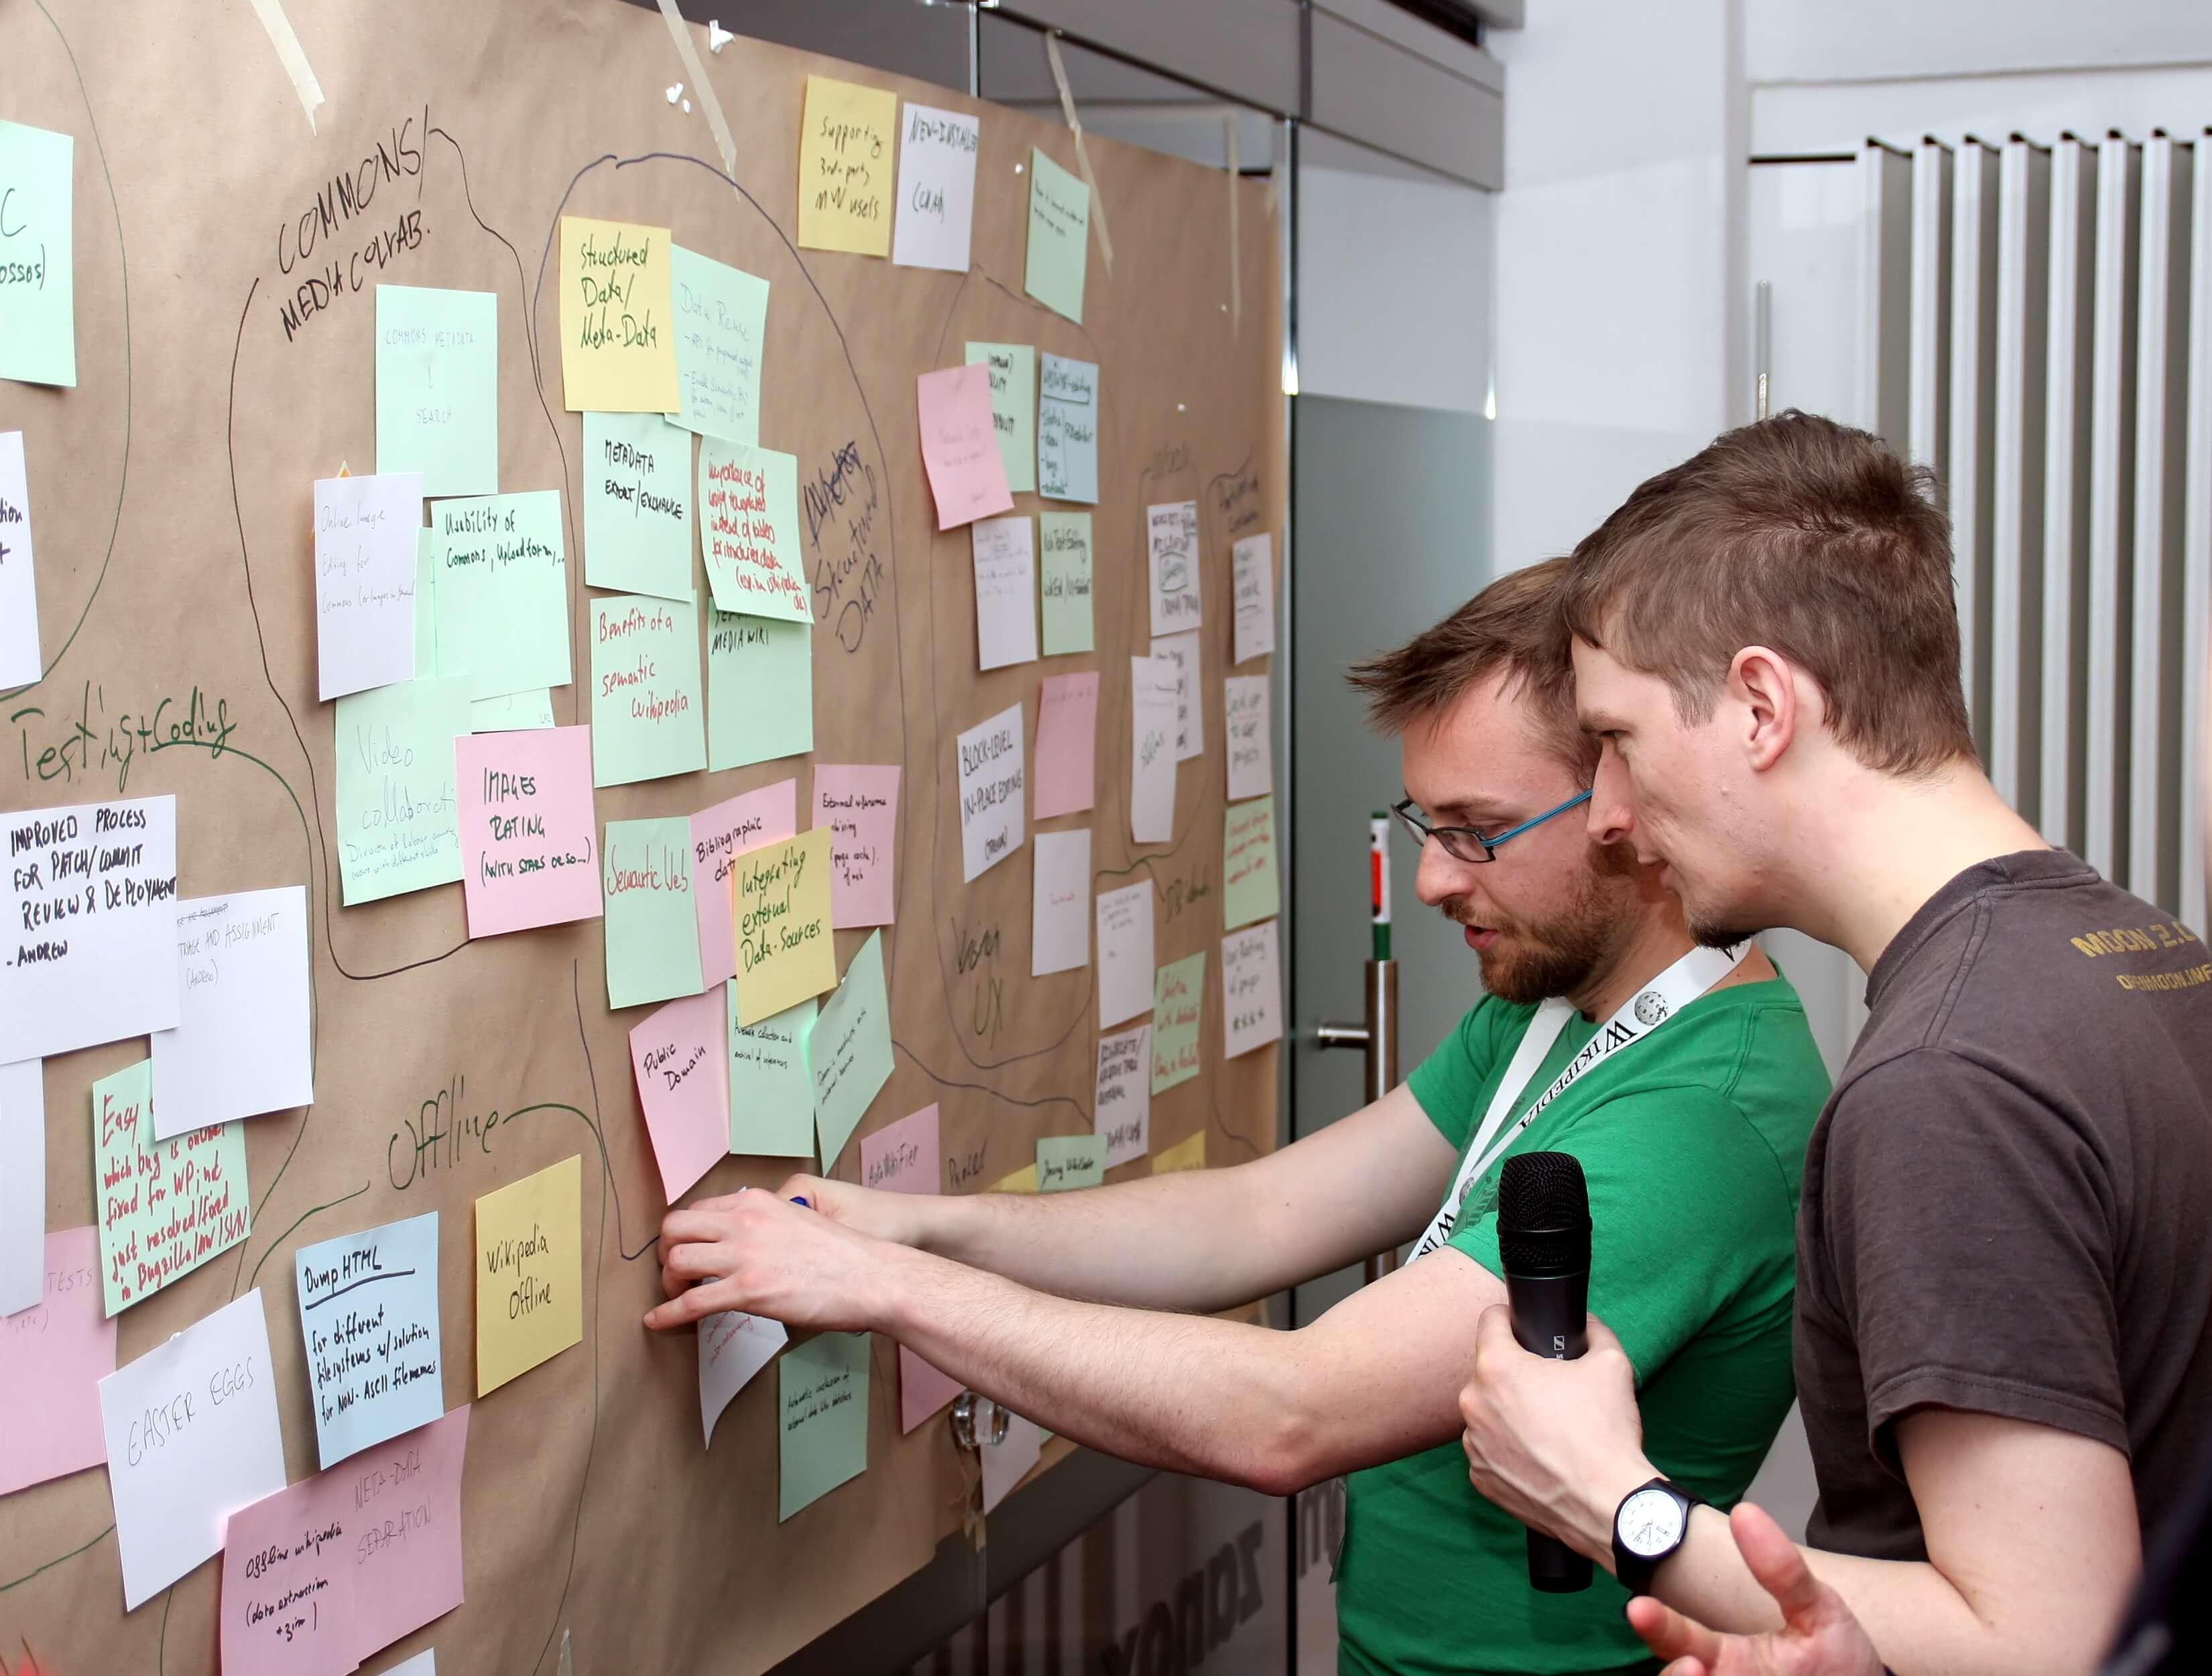 hire python developers, Hire Python Developers for Your Web/App Development Projects